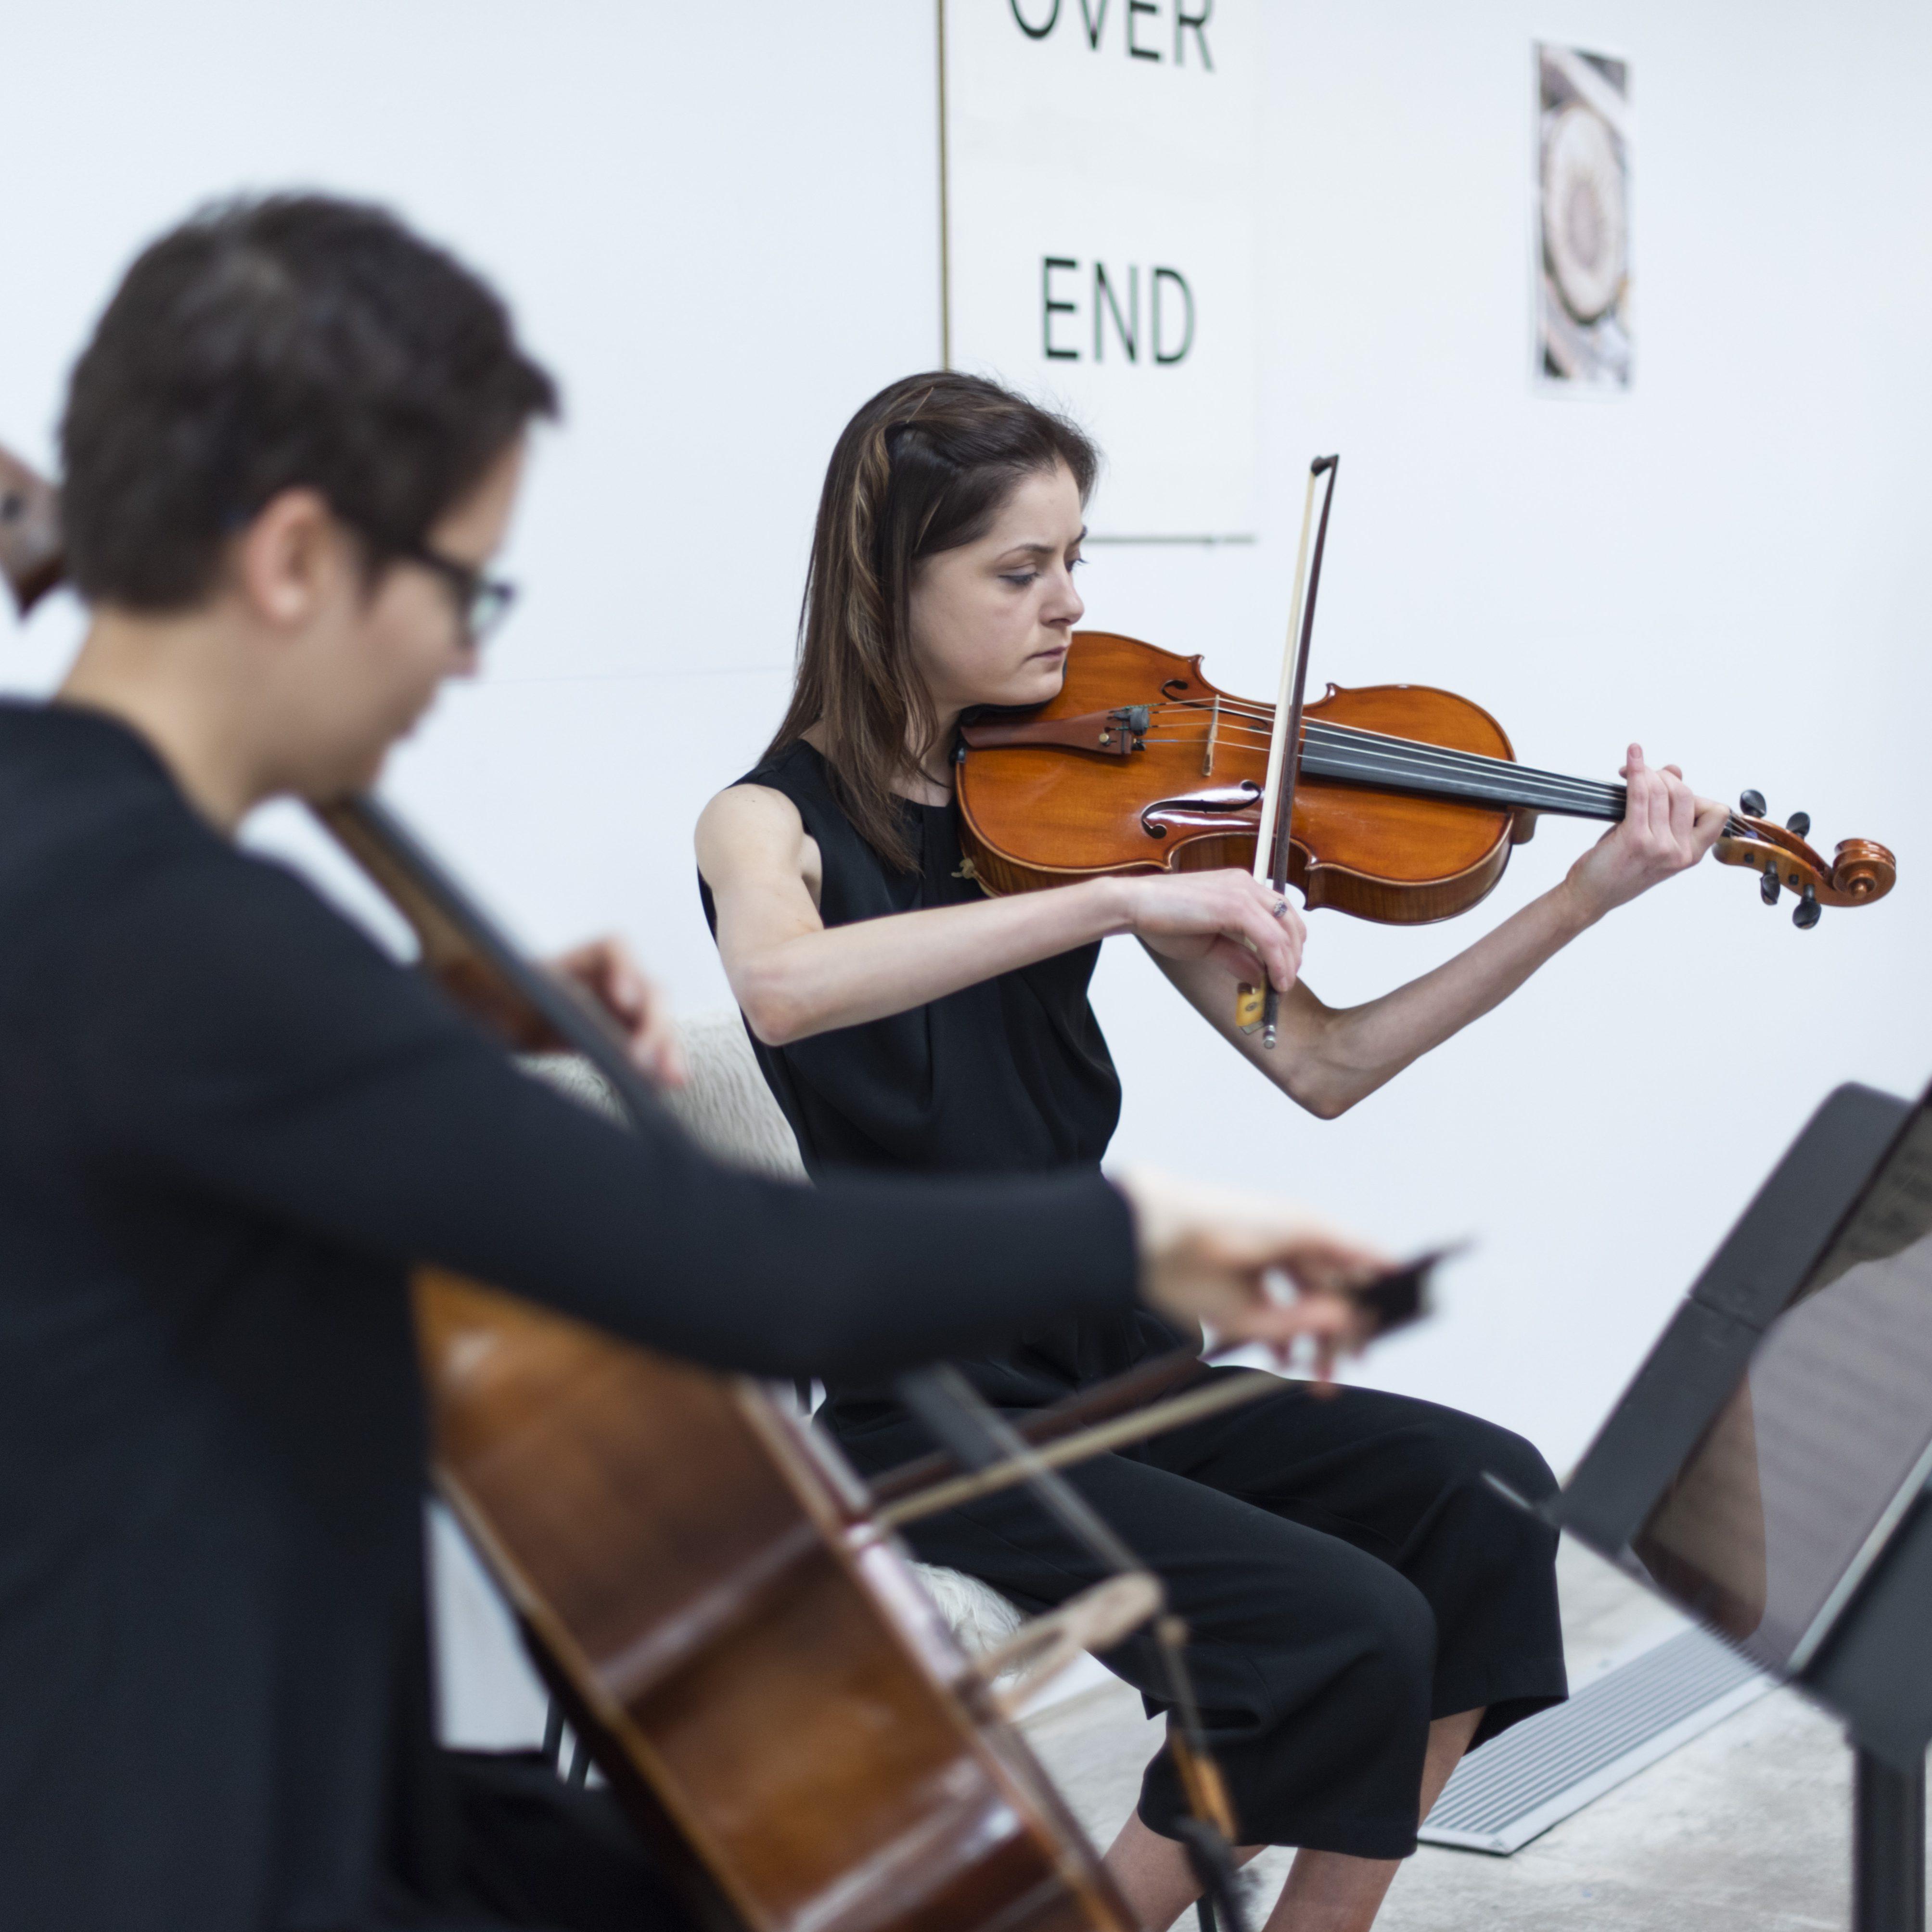 Julia Janiszewski, cello, and Alina Zamfir, viola, inaugural Kingsland Residents